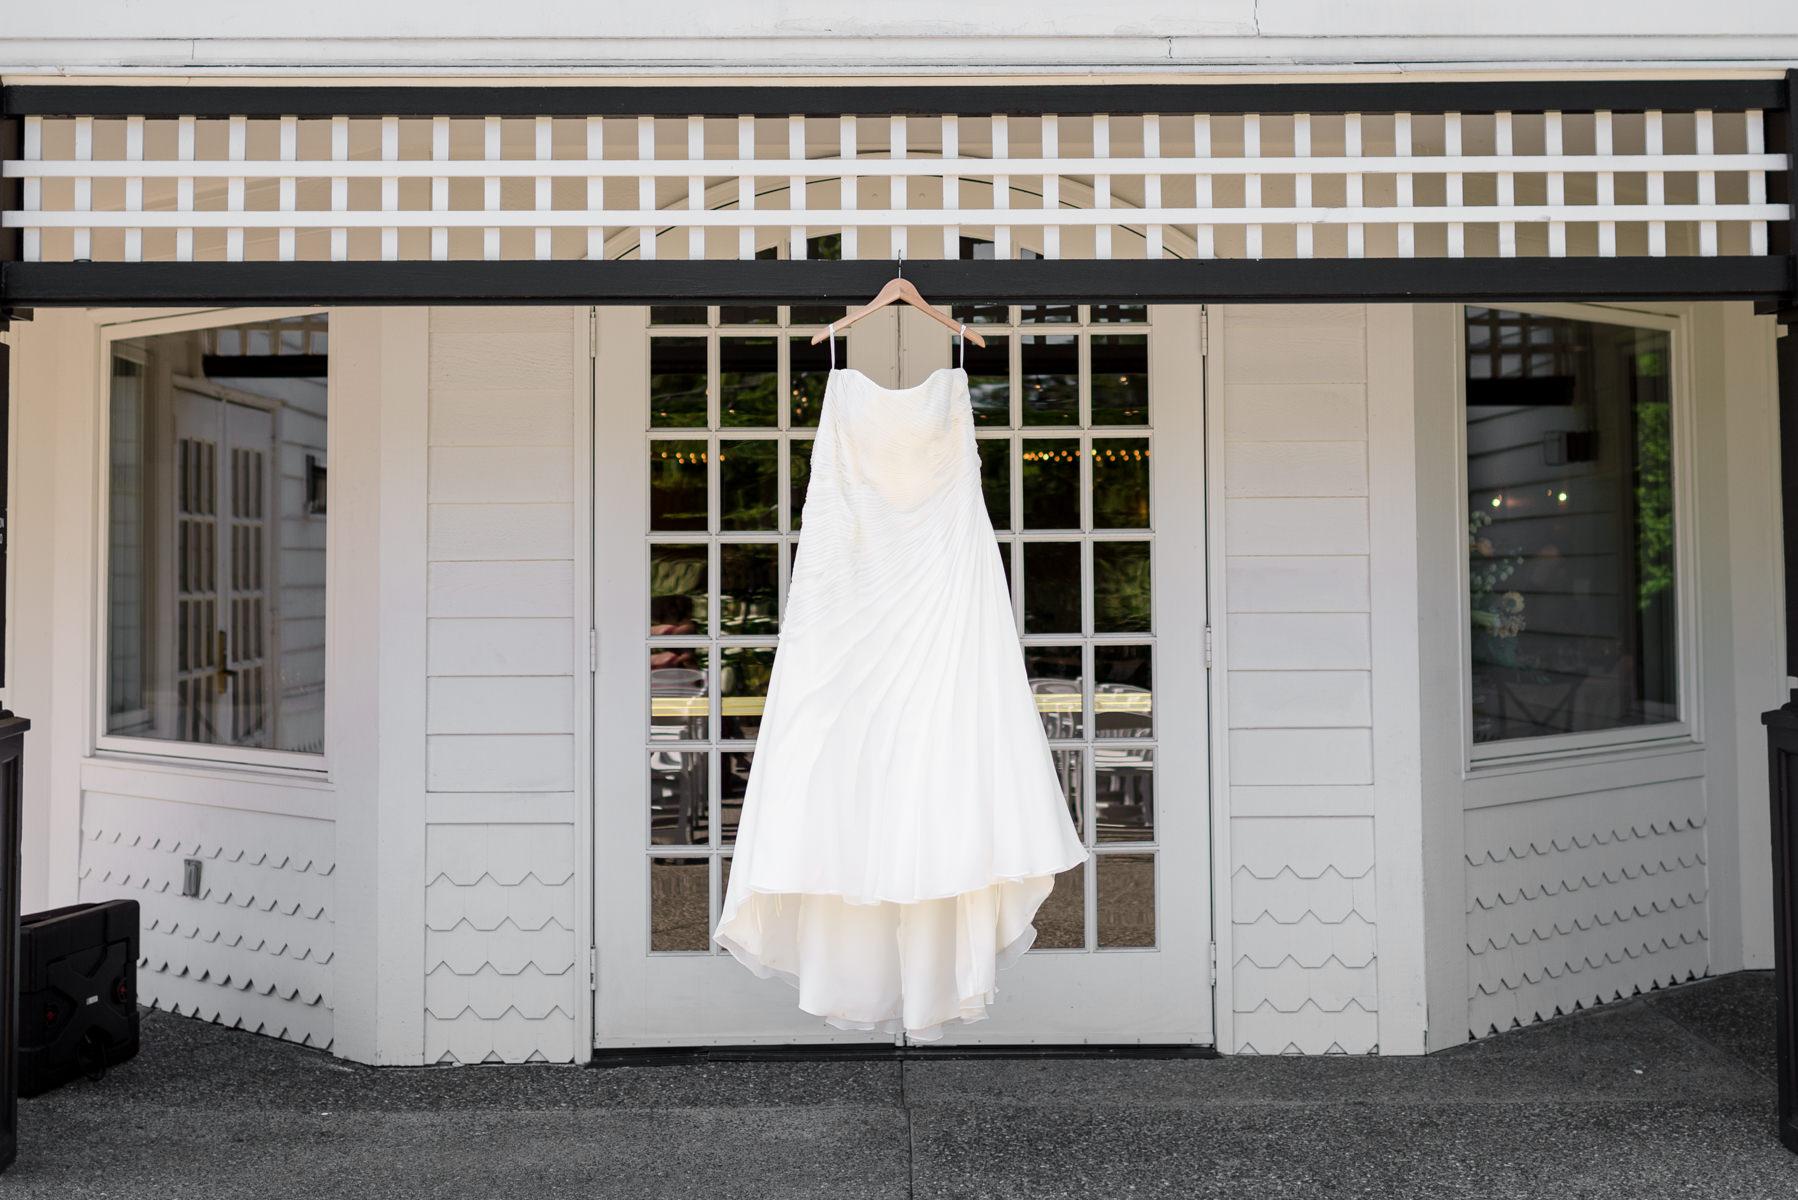 Andrew Tat - Documentary Wedding Photography - Columbia Winery - Woodinville, Washington -Patricia & Teffin - 01.jpg